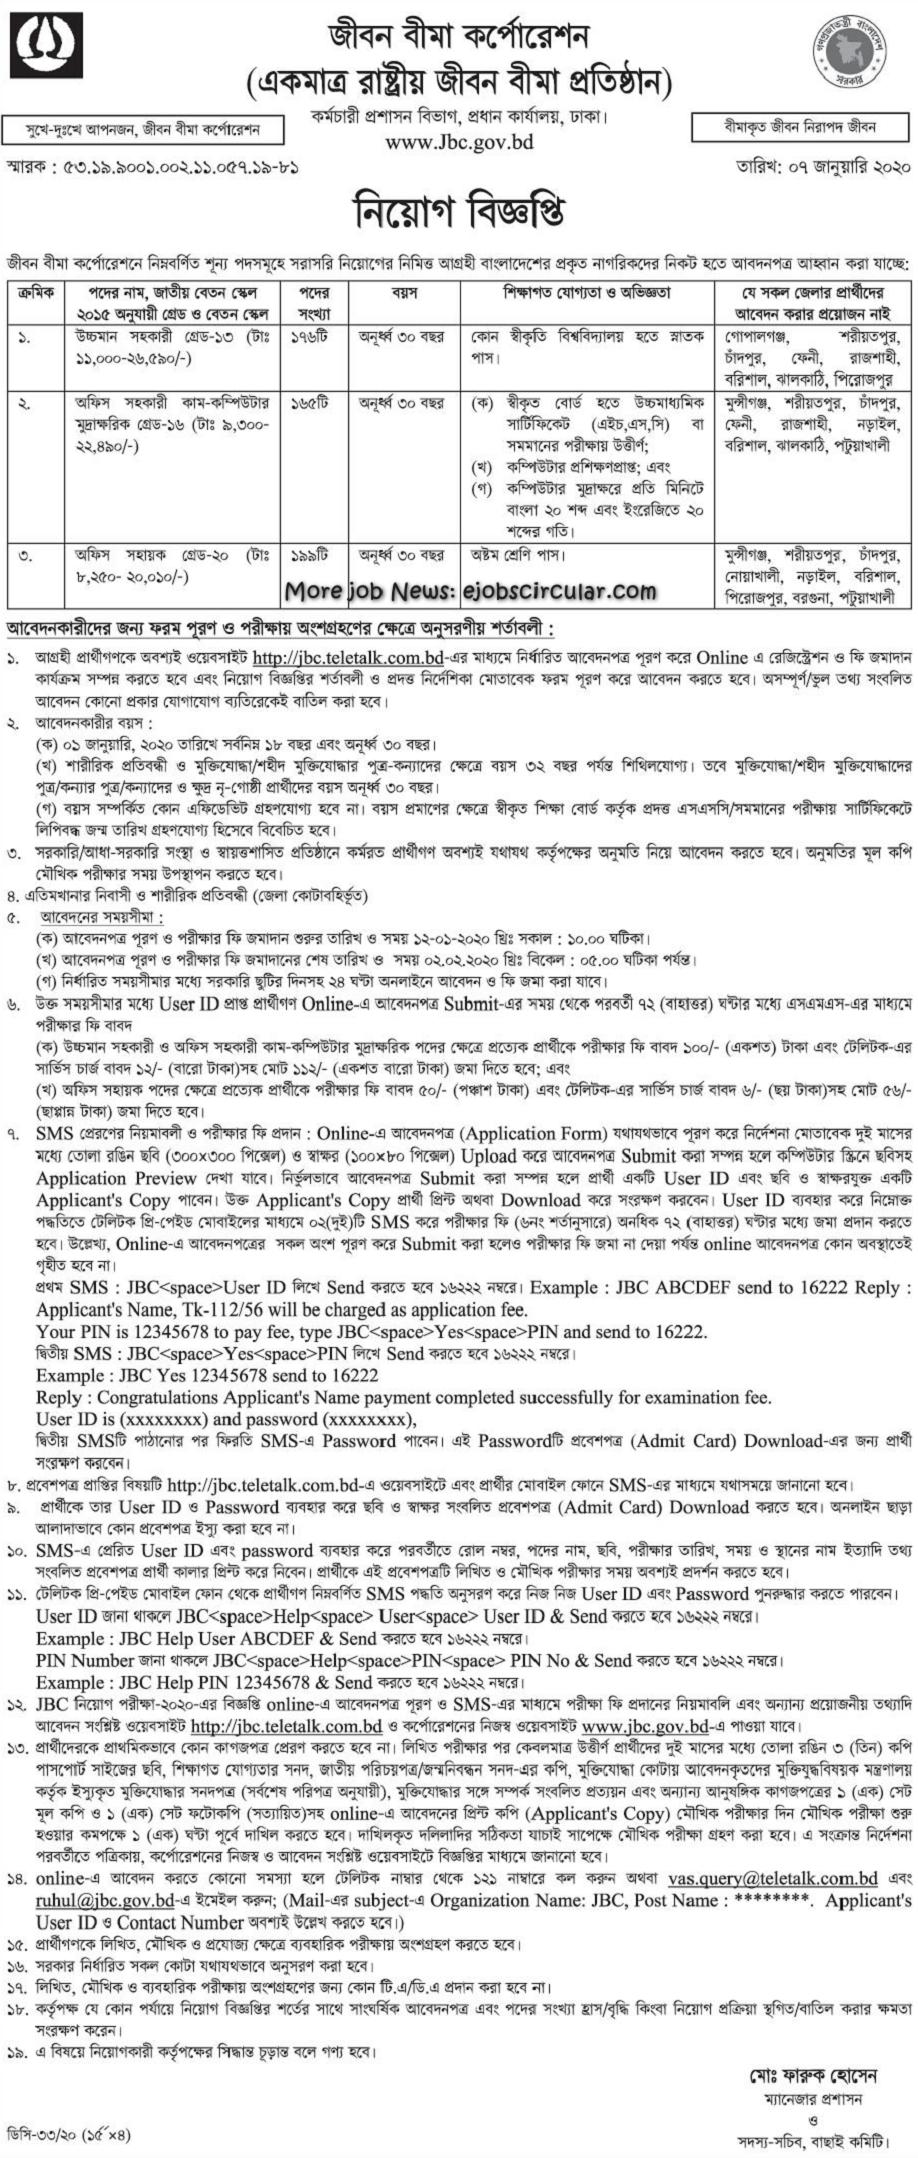 Jiban Bima Corporation (JBC) Job Circular 2020